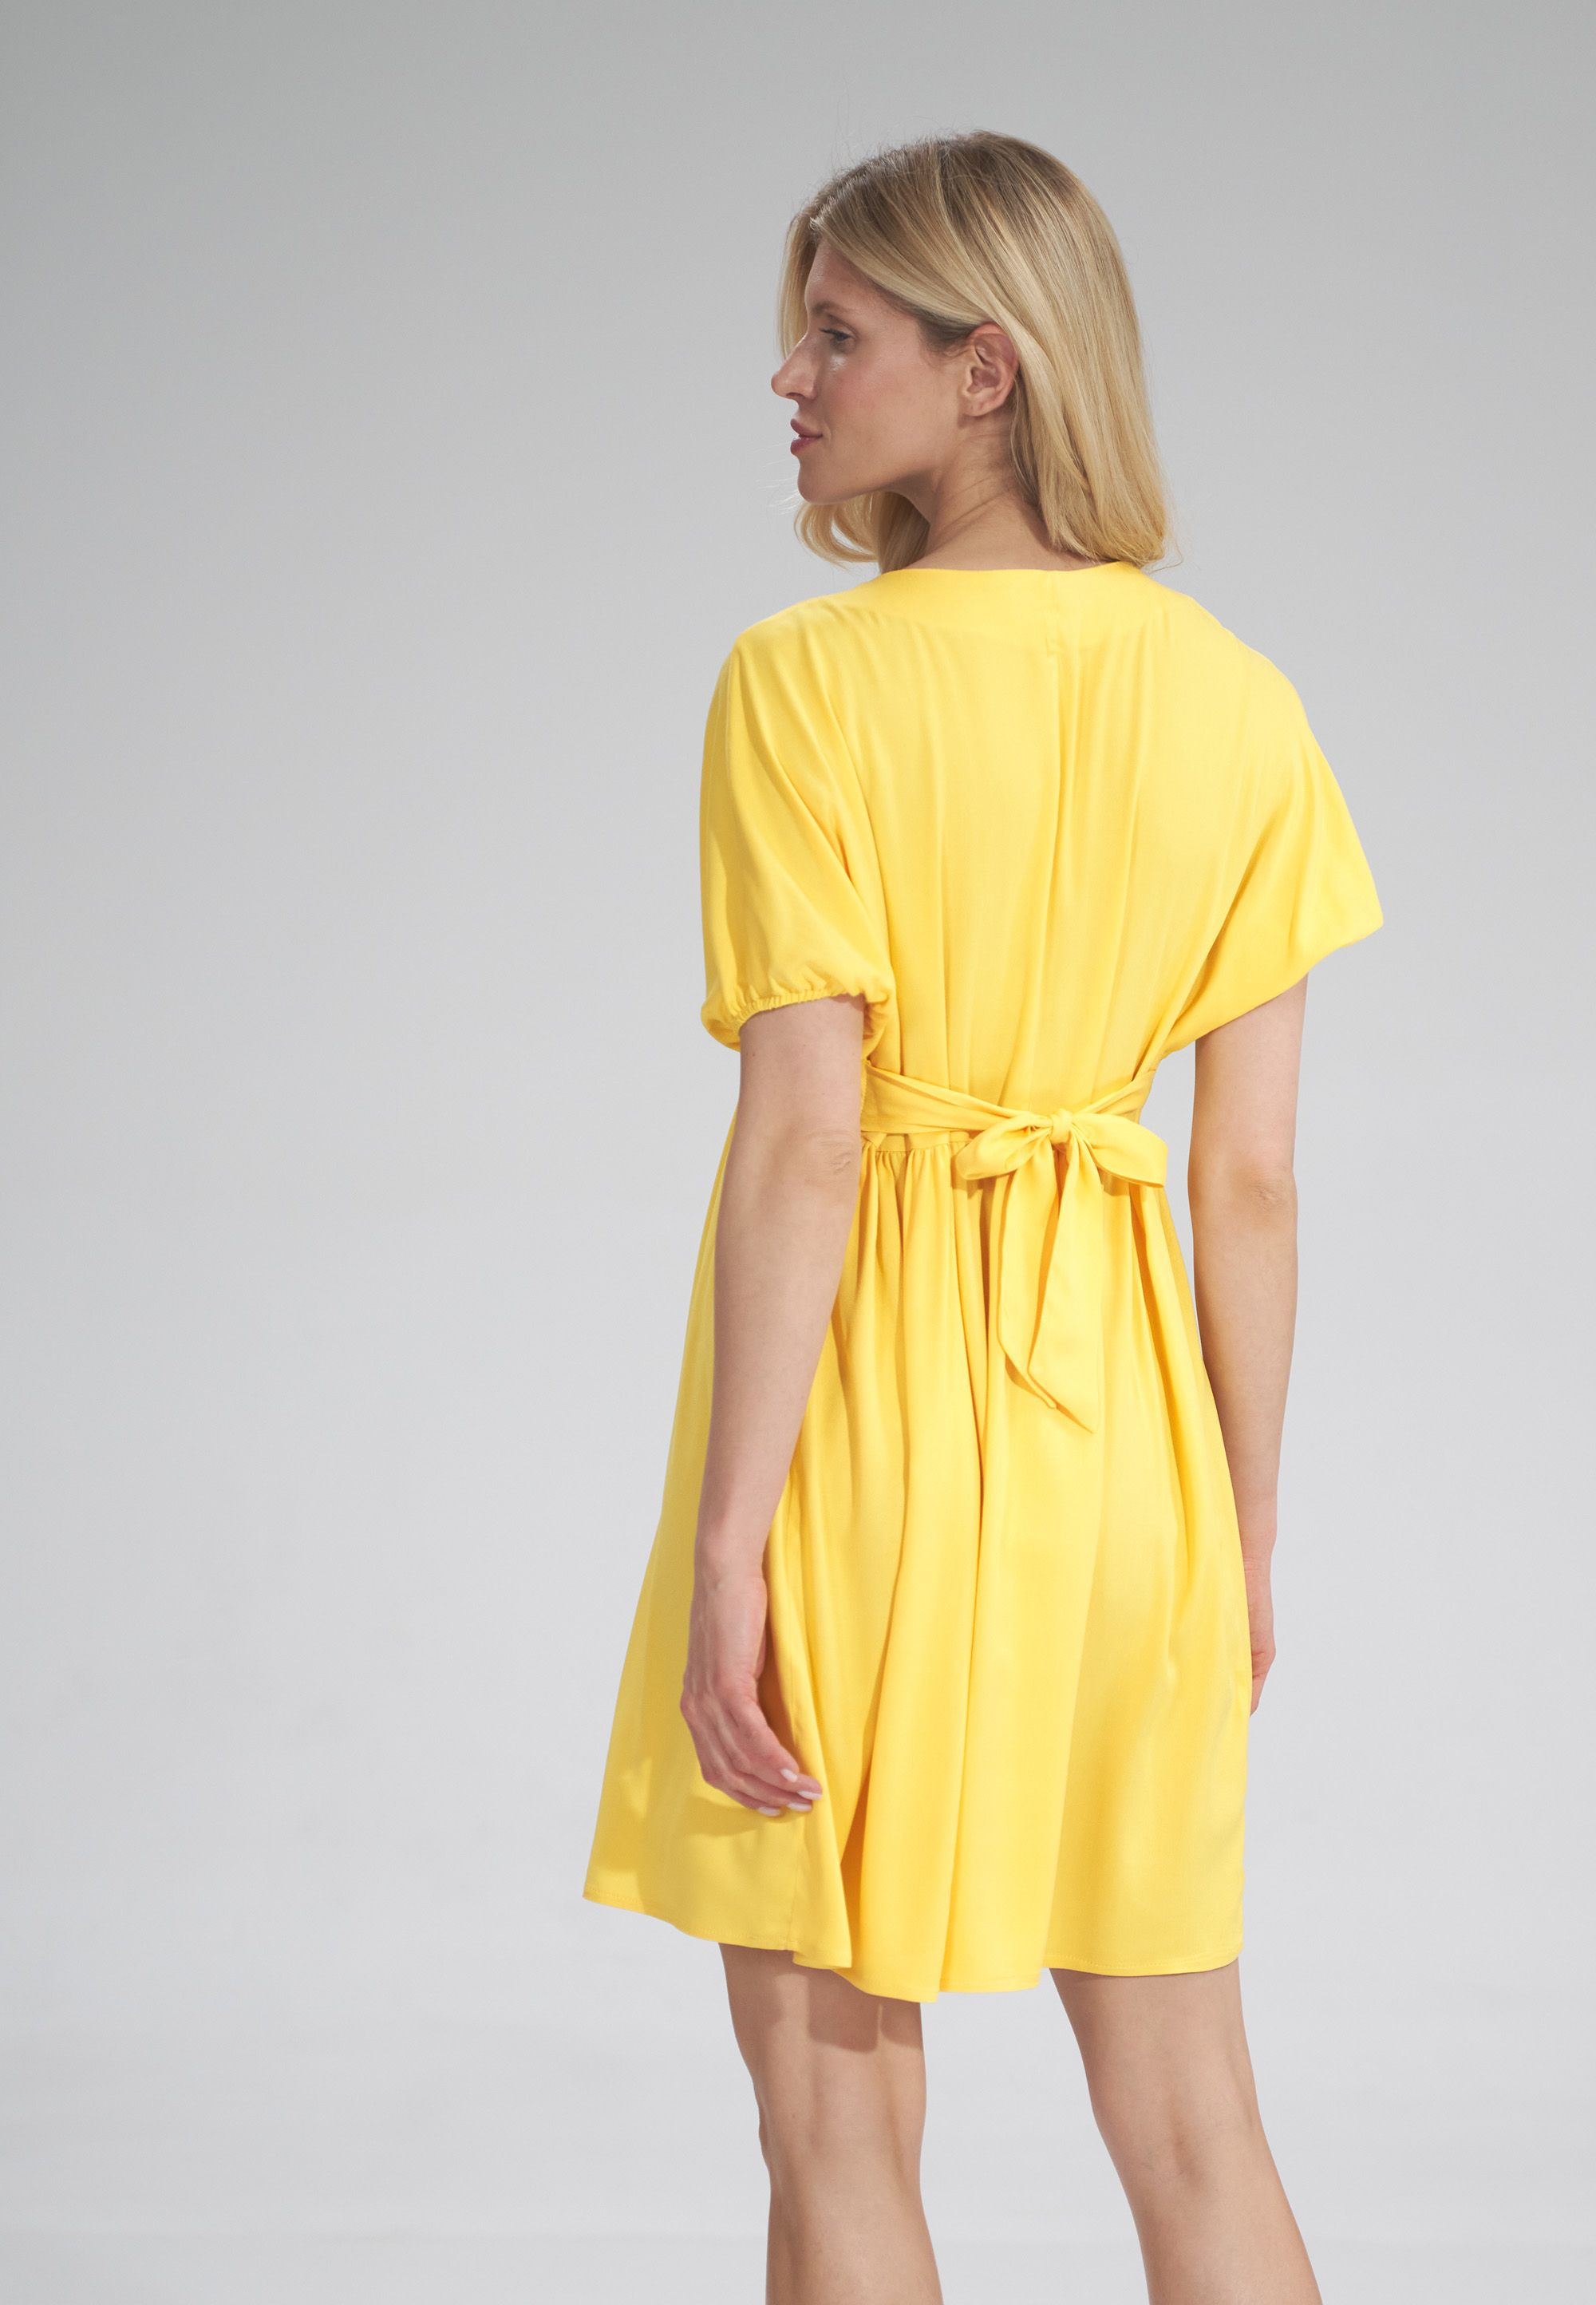 Loose knee-length dress